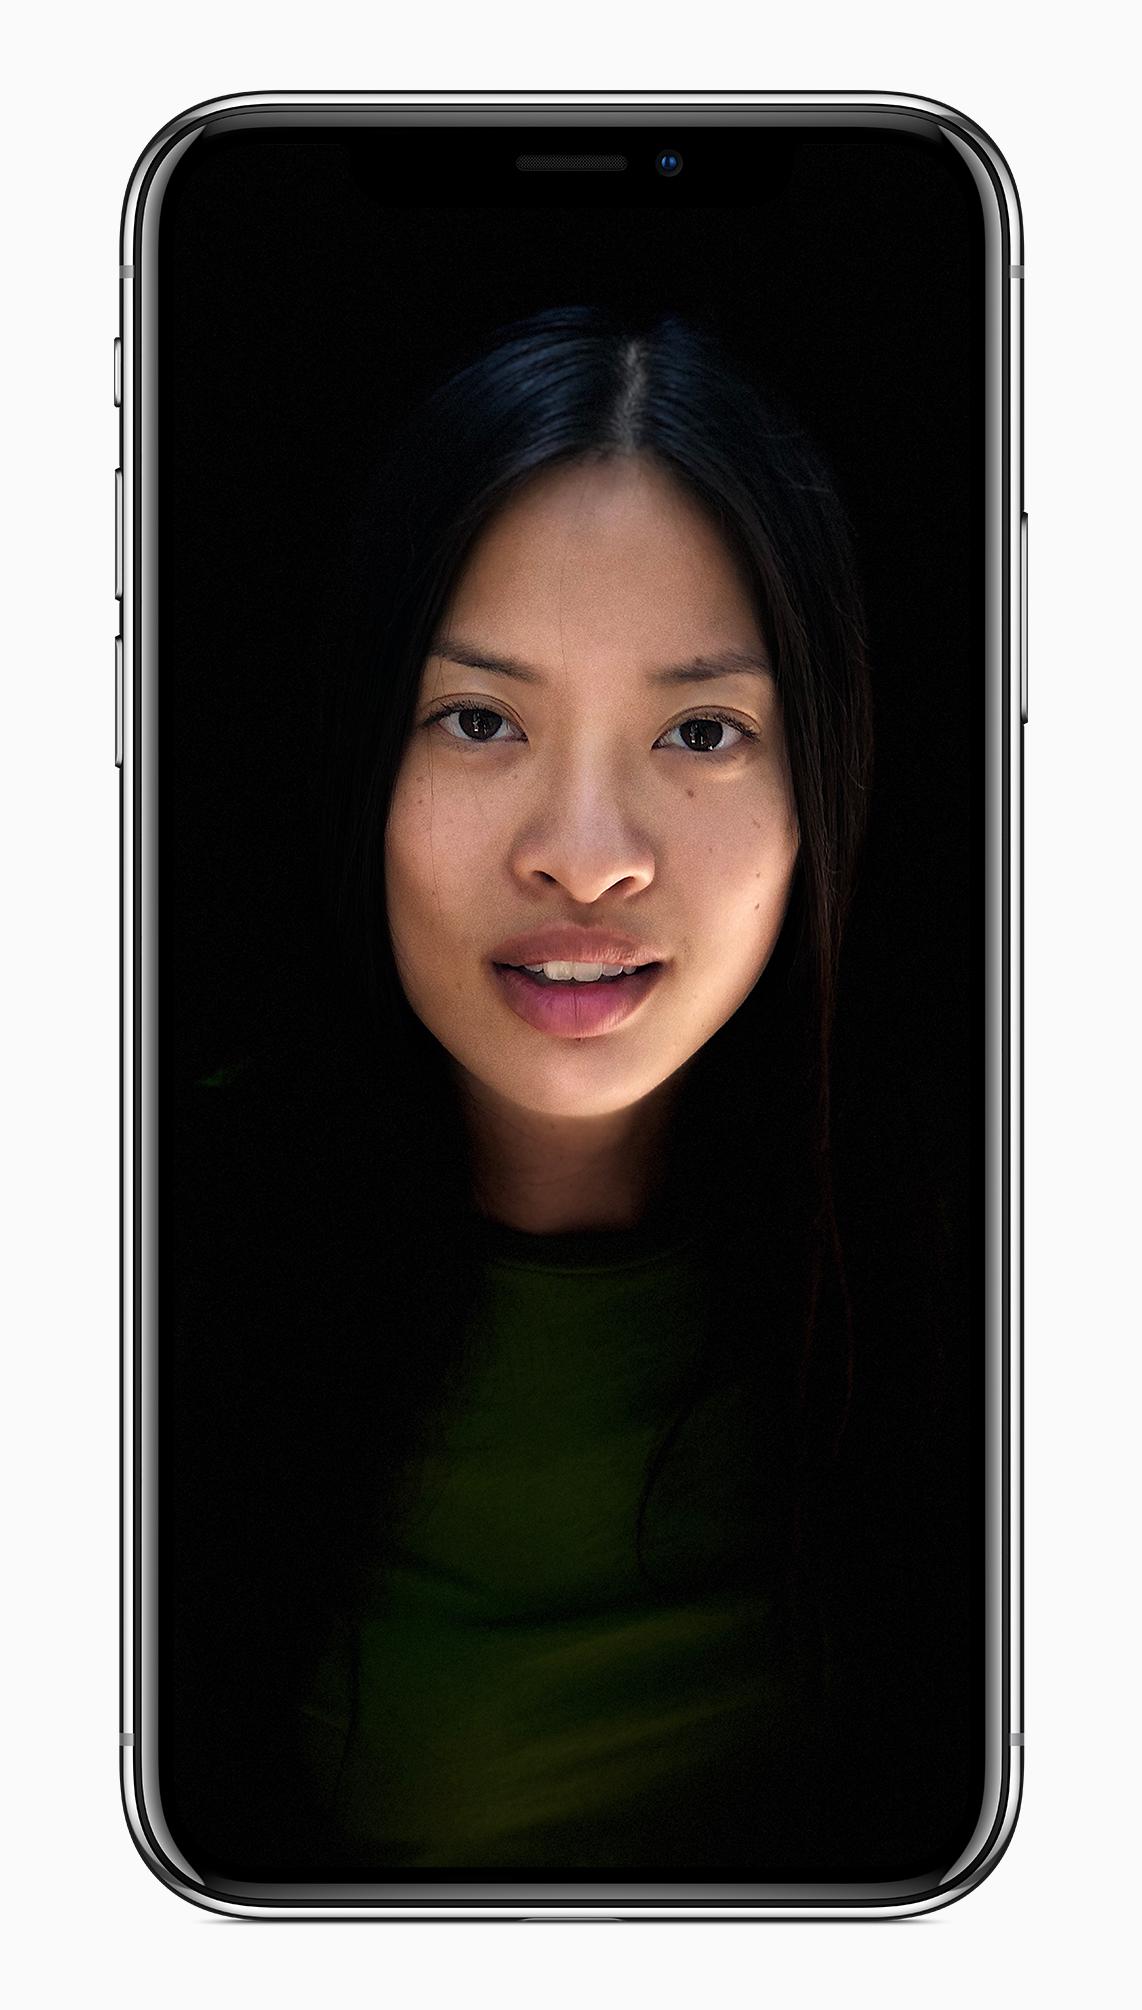 apple iphone x neues iphone modell f r drohnen steuerung. Black Bedroom Furniture Sets. Home Design Ideas